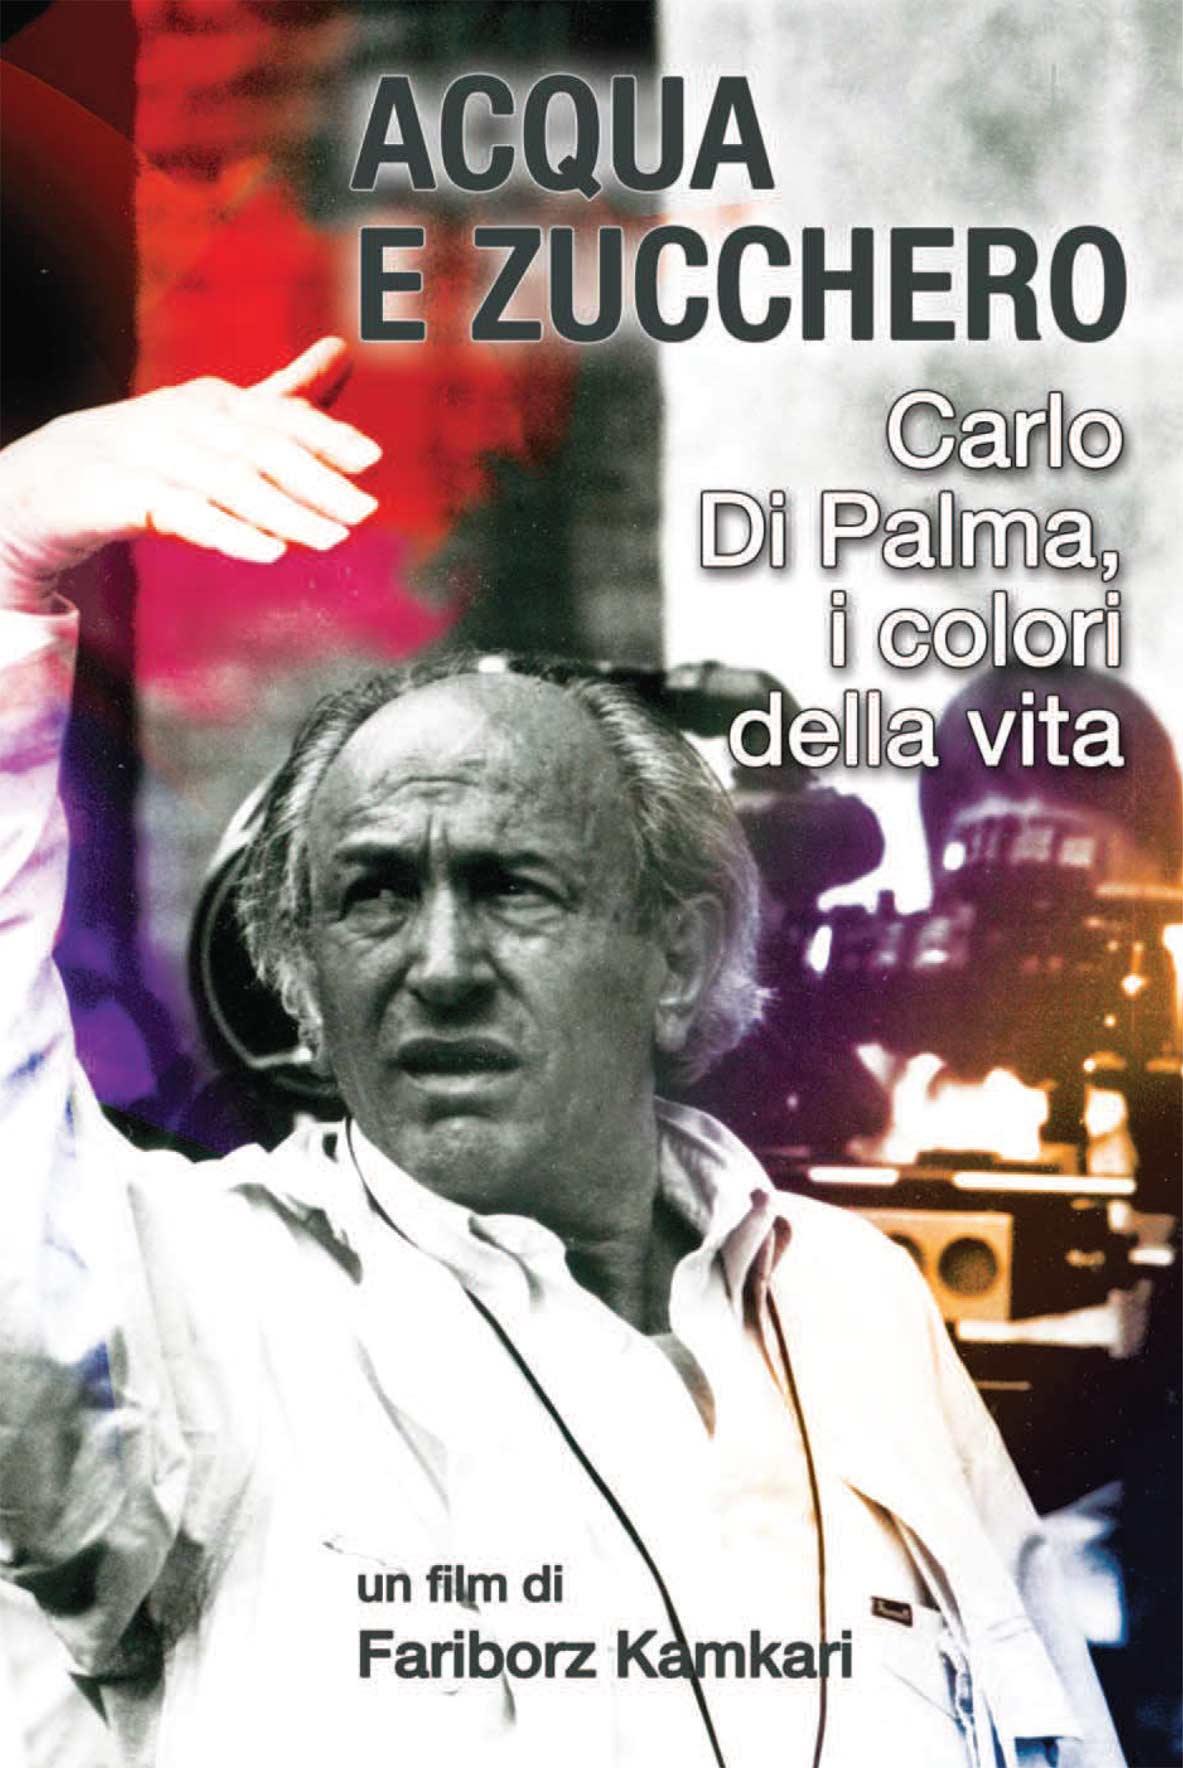 ACQUA E ZUCCHERO (DVD)